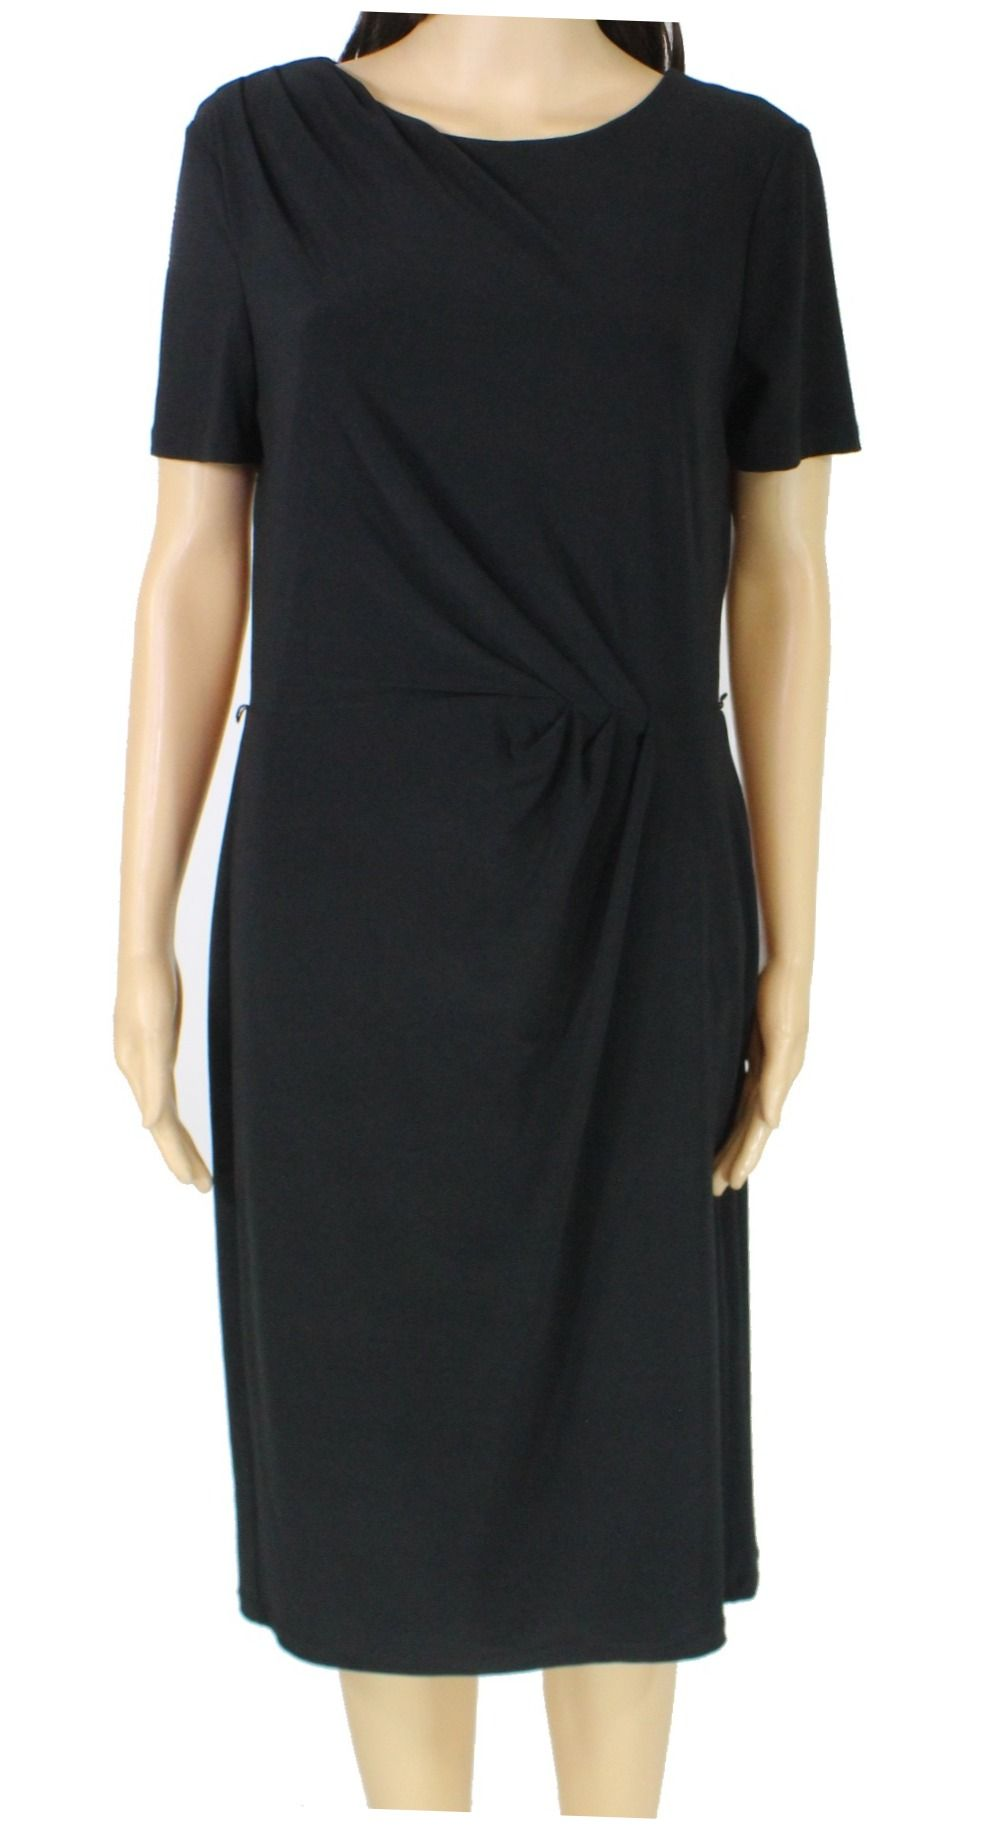 Lauren By RALPH LAUREN Women's Dress Black Size 12 Sheath Ruched Front